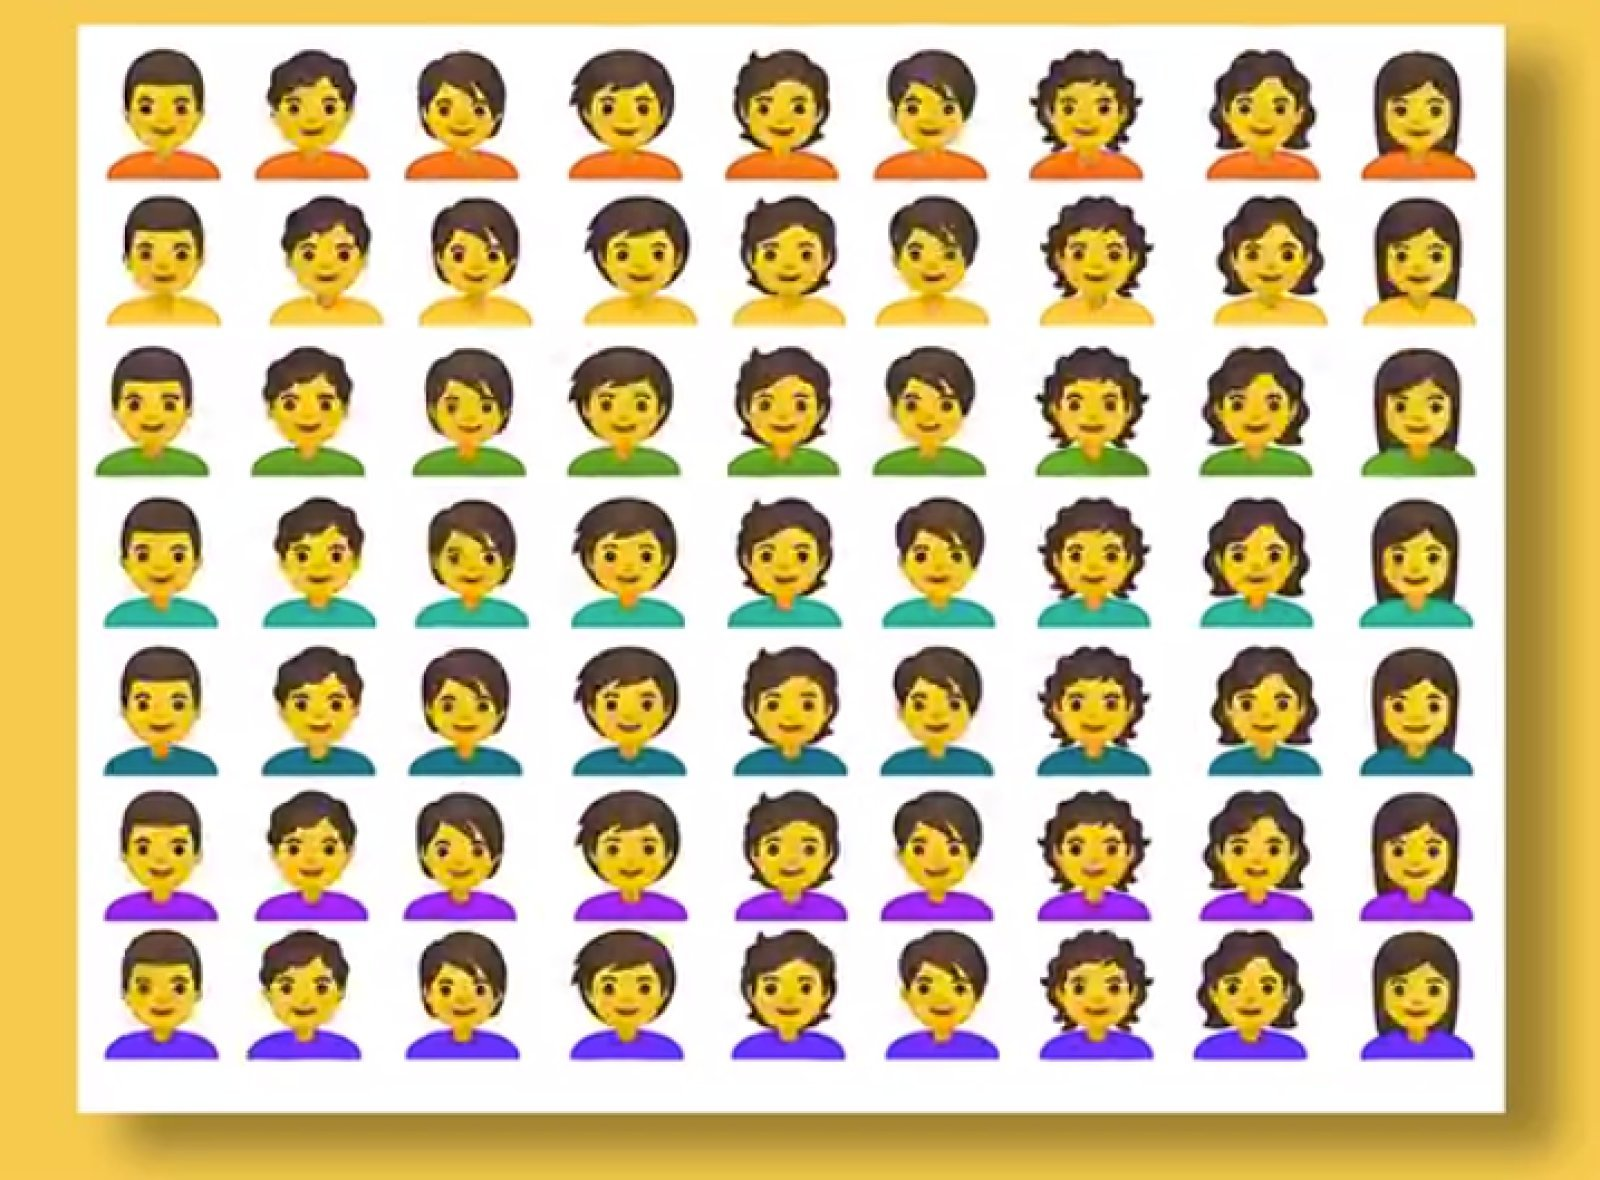 Google Android 10 Q emoji gender Apple iOS 13 jakie emotki